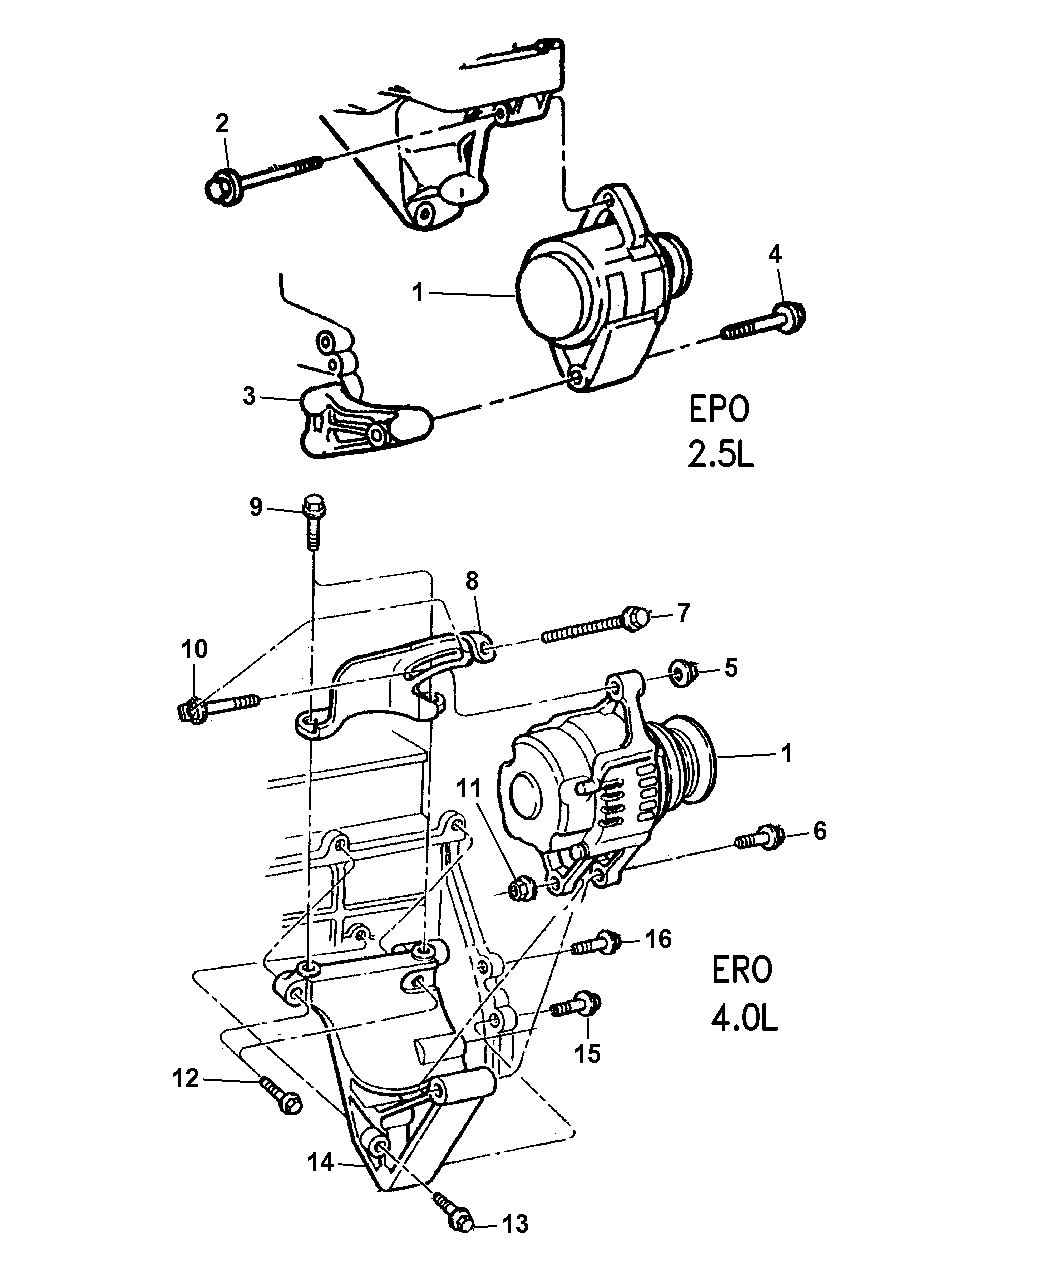 1999 Jeep Cherokee Alternator Wiring Diagram